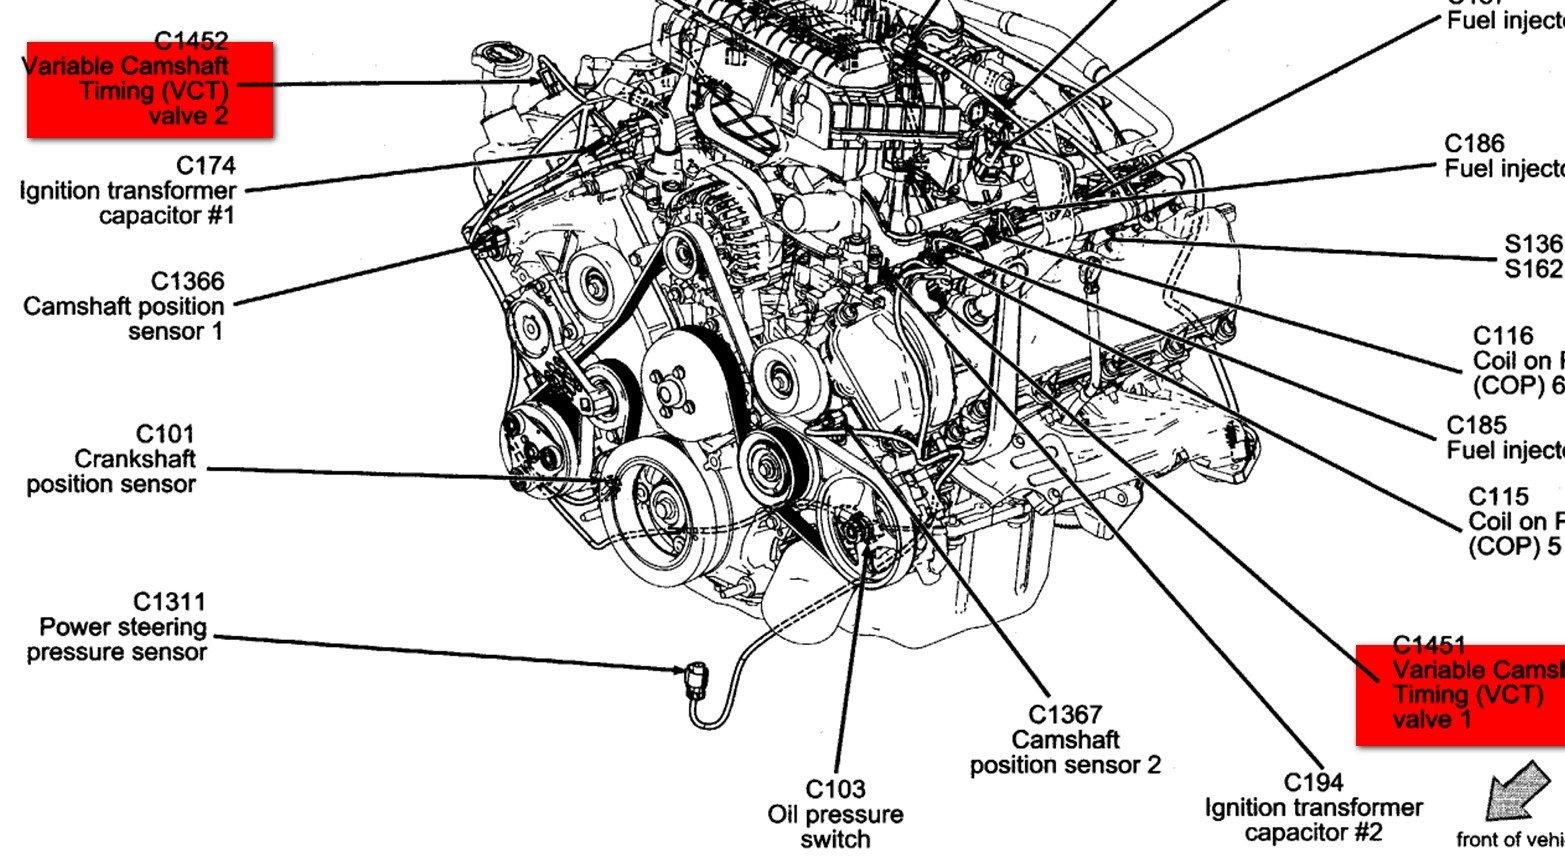 84 F150 5l Wiring Diagram Full Hd Version Wiring Diagram Marz Diagram Arroccoturicchi It